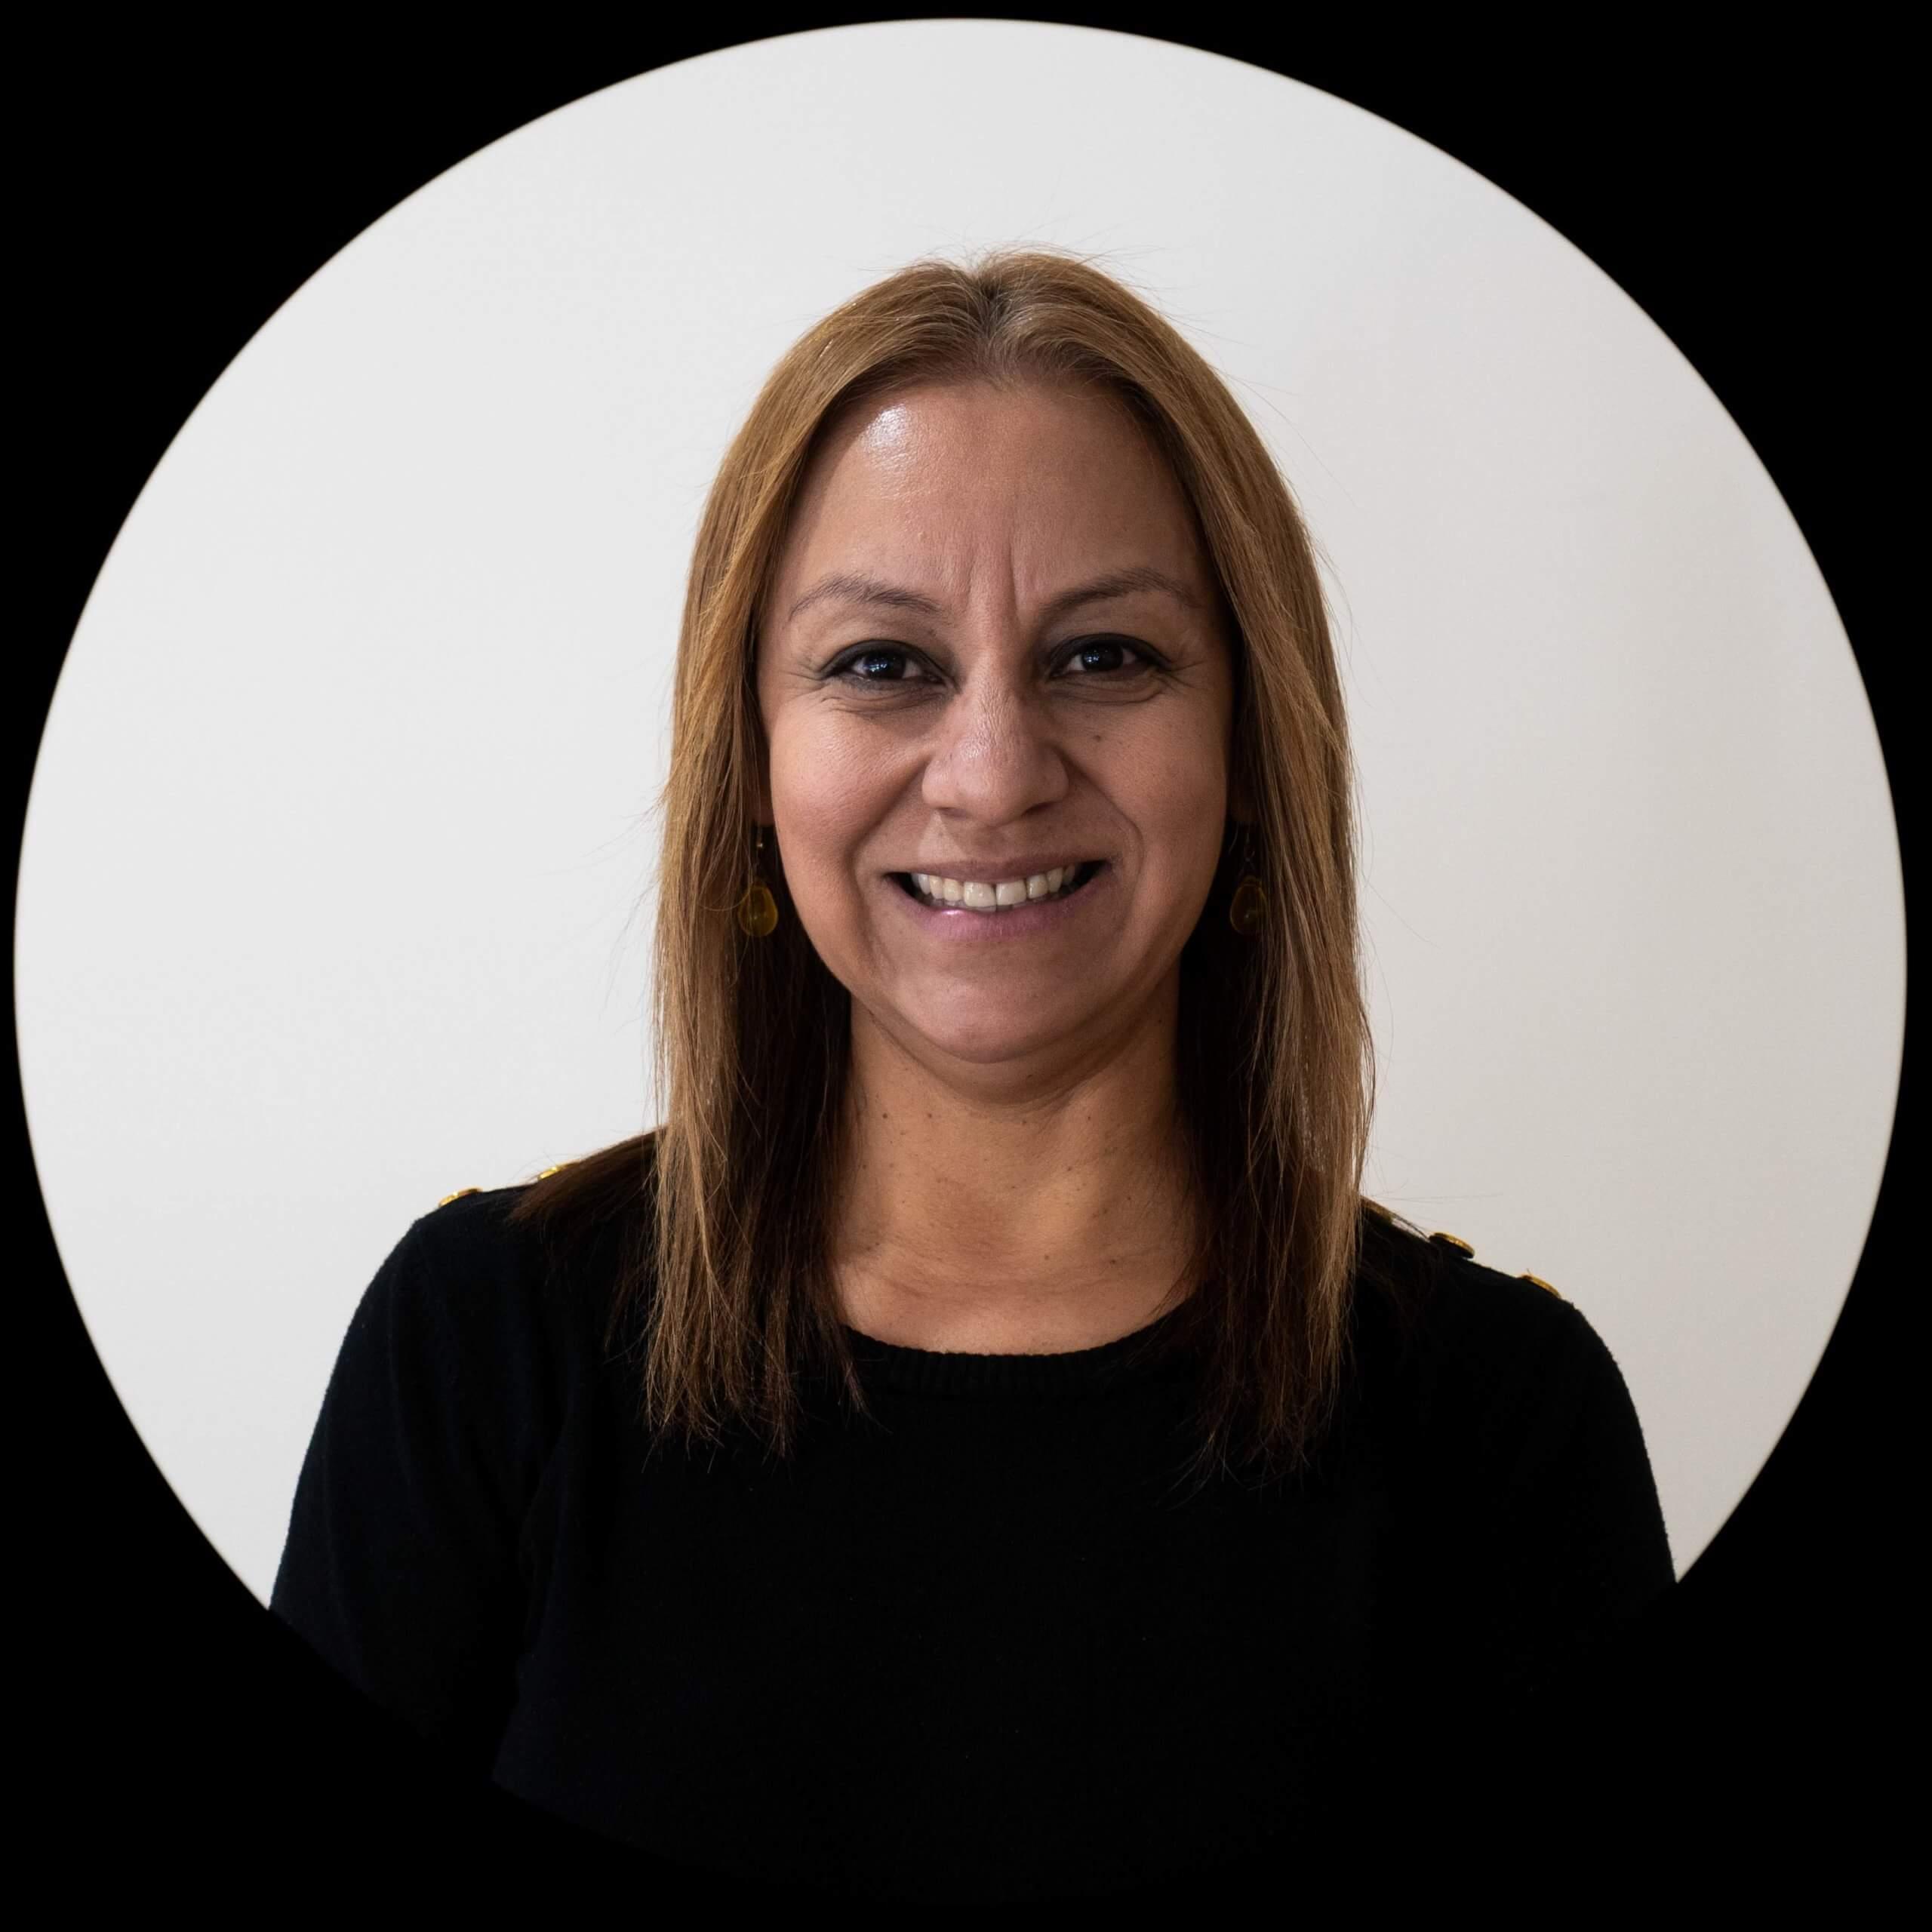 Gina Paramo